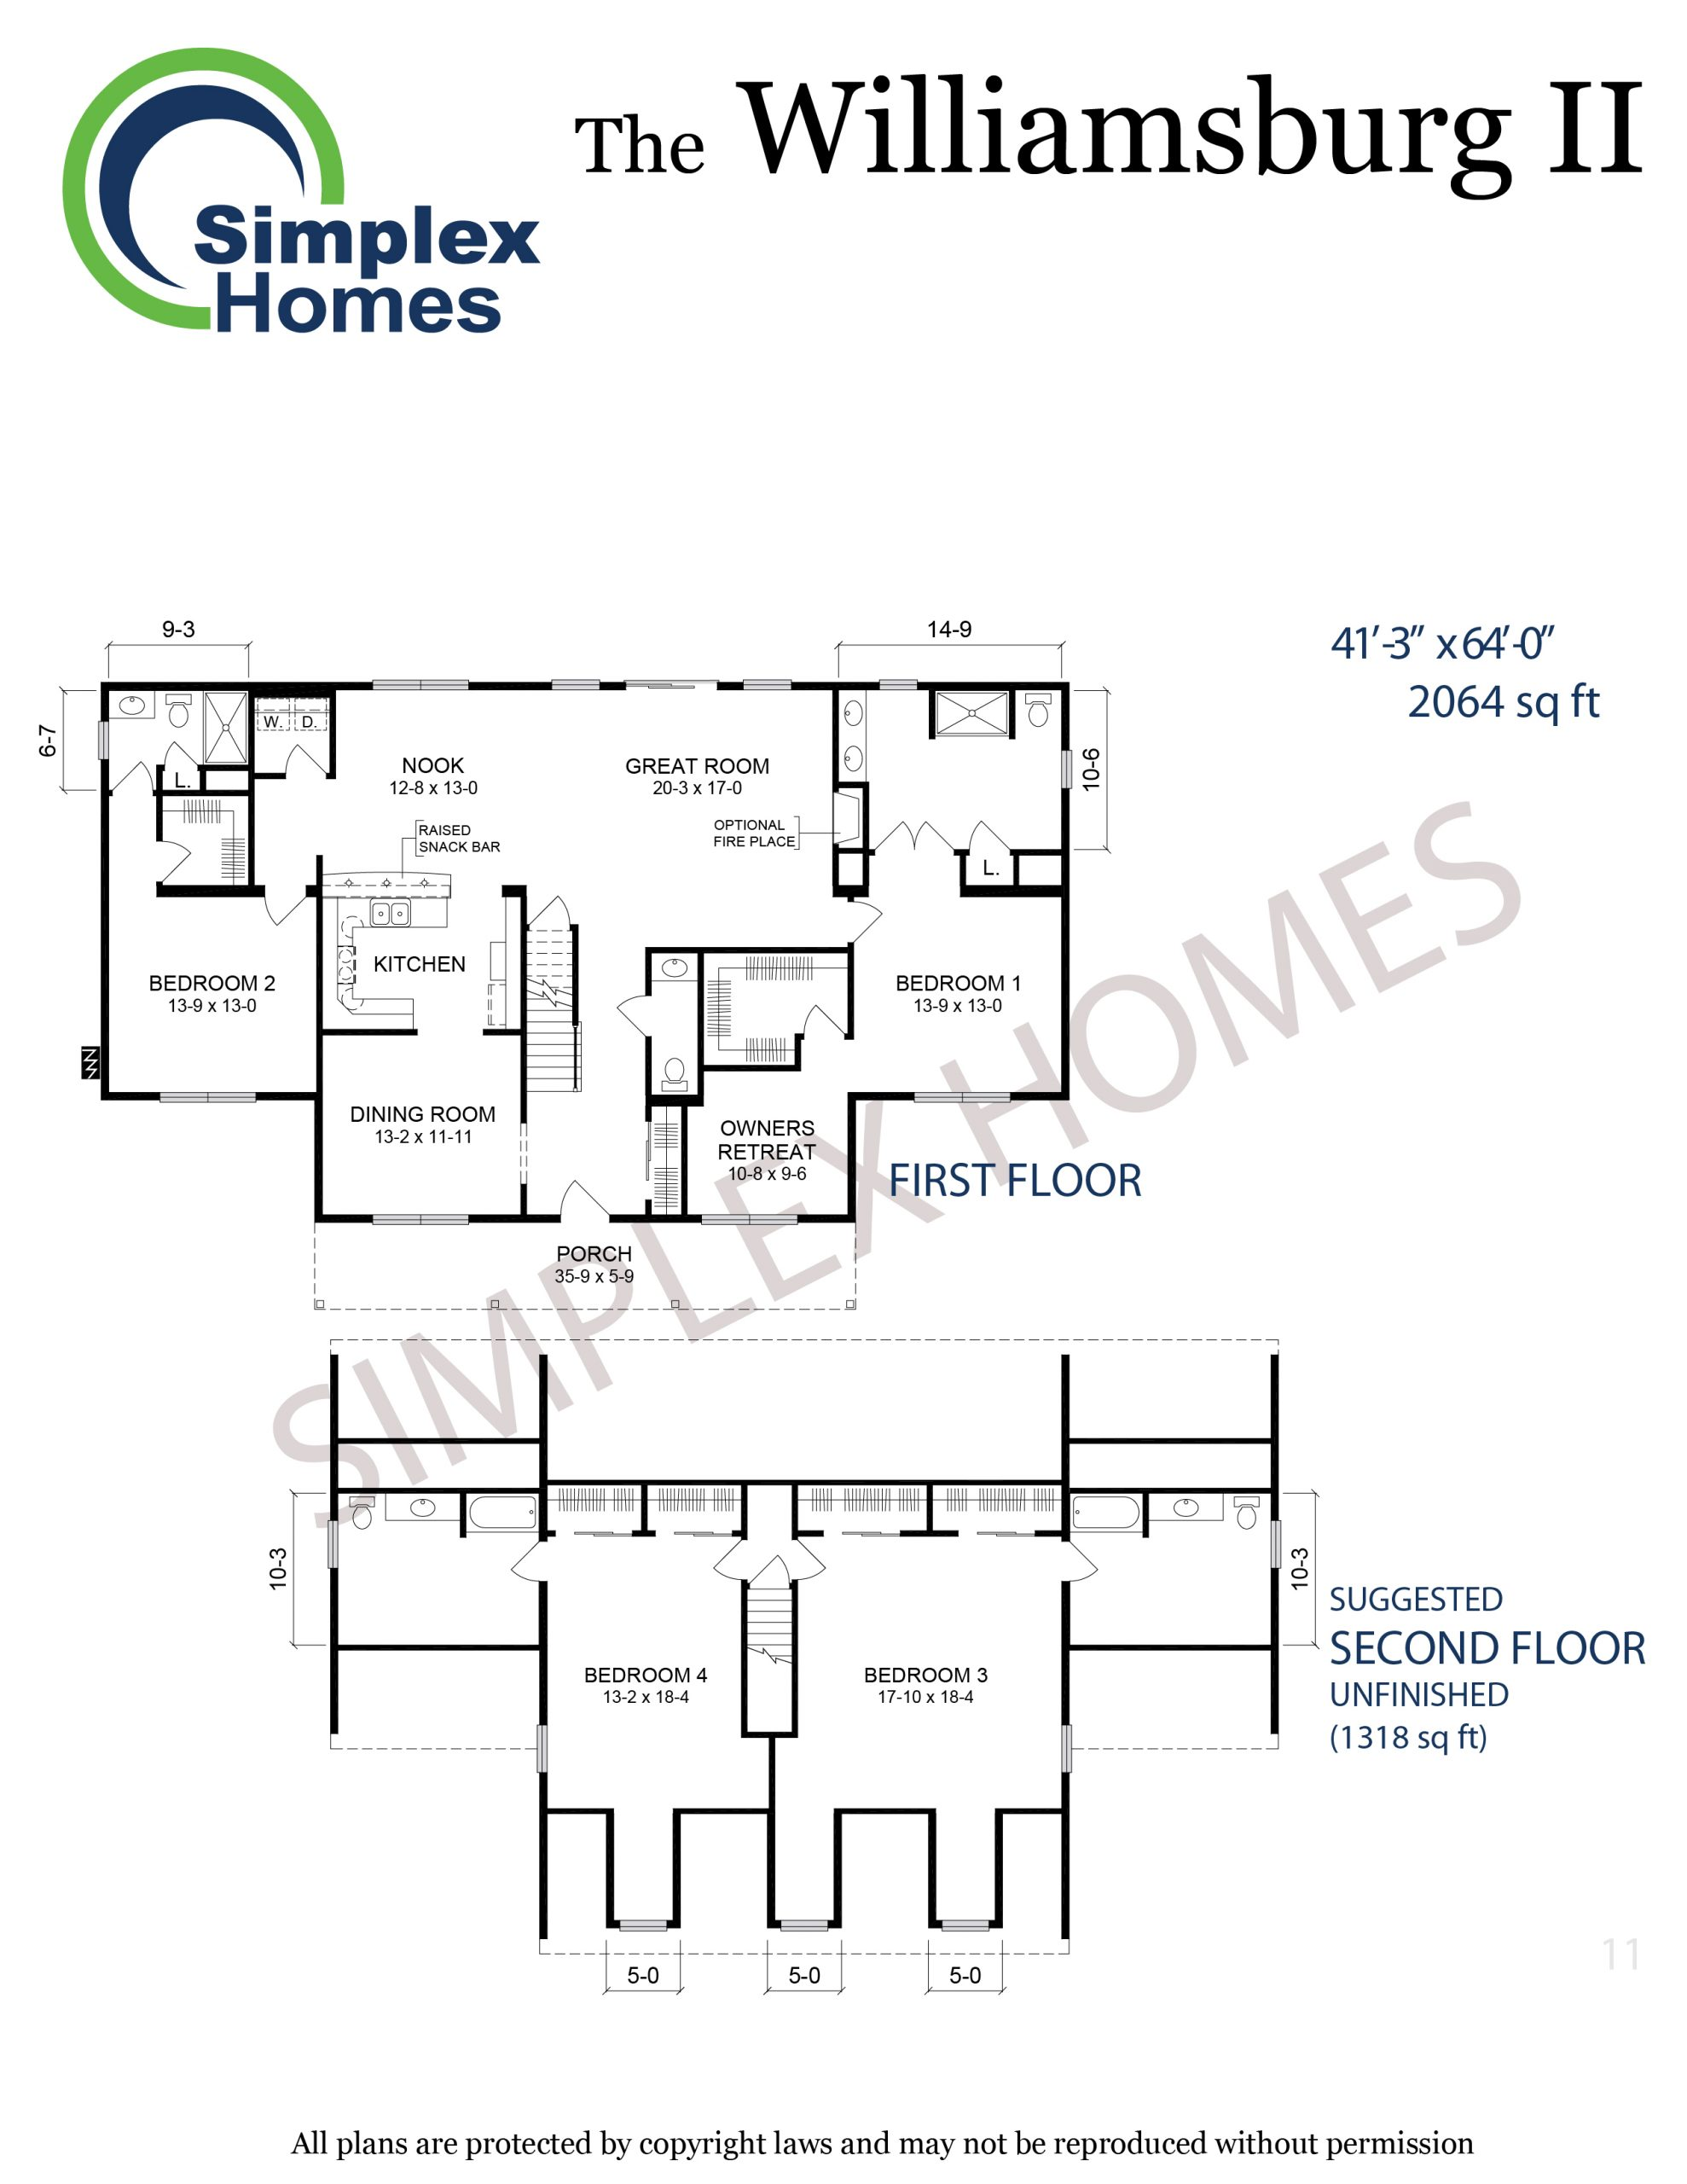 Williamsburg II floor plan